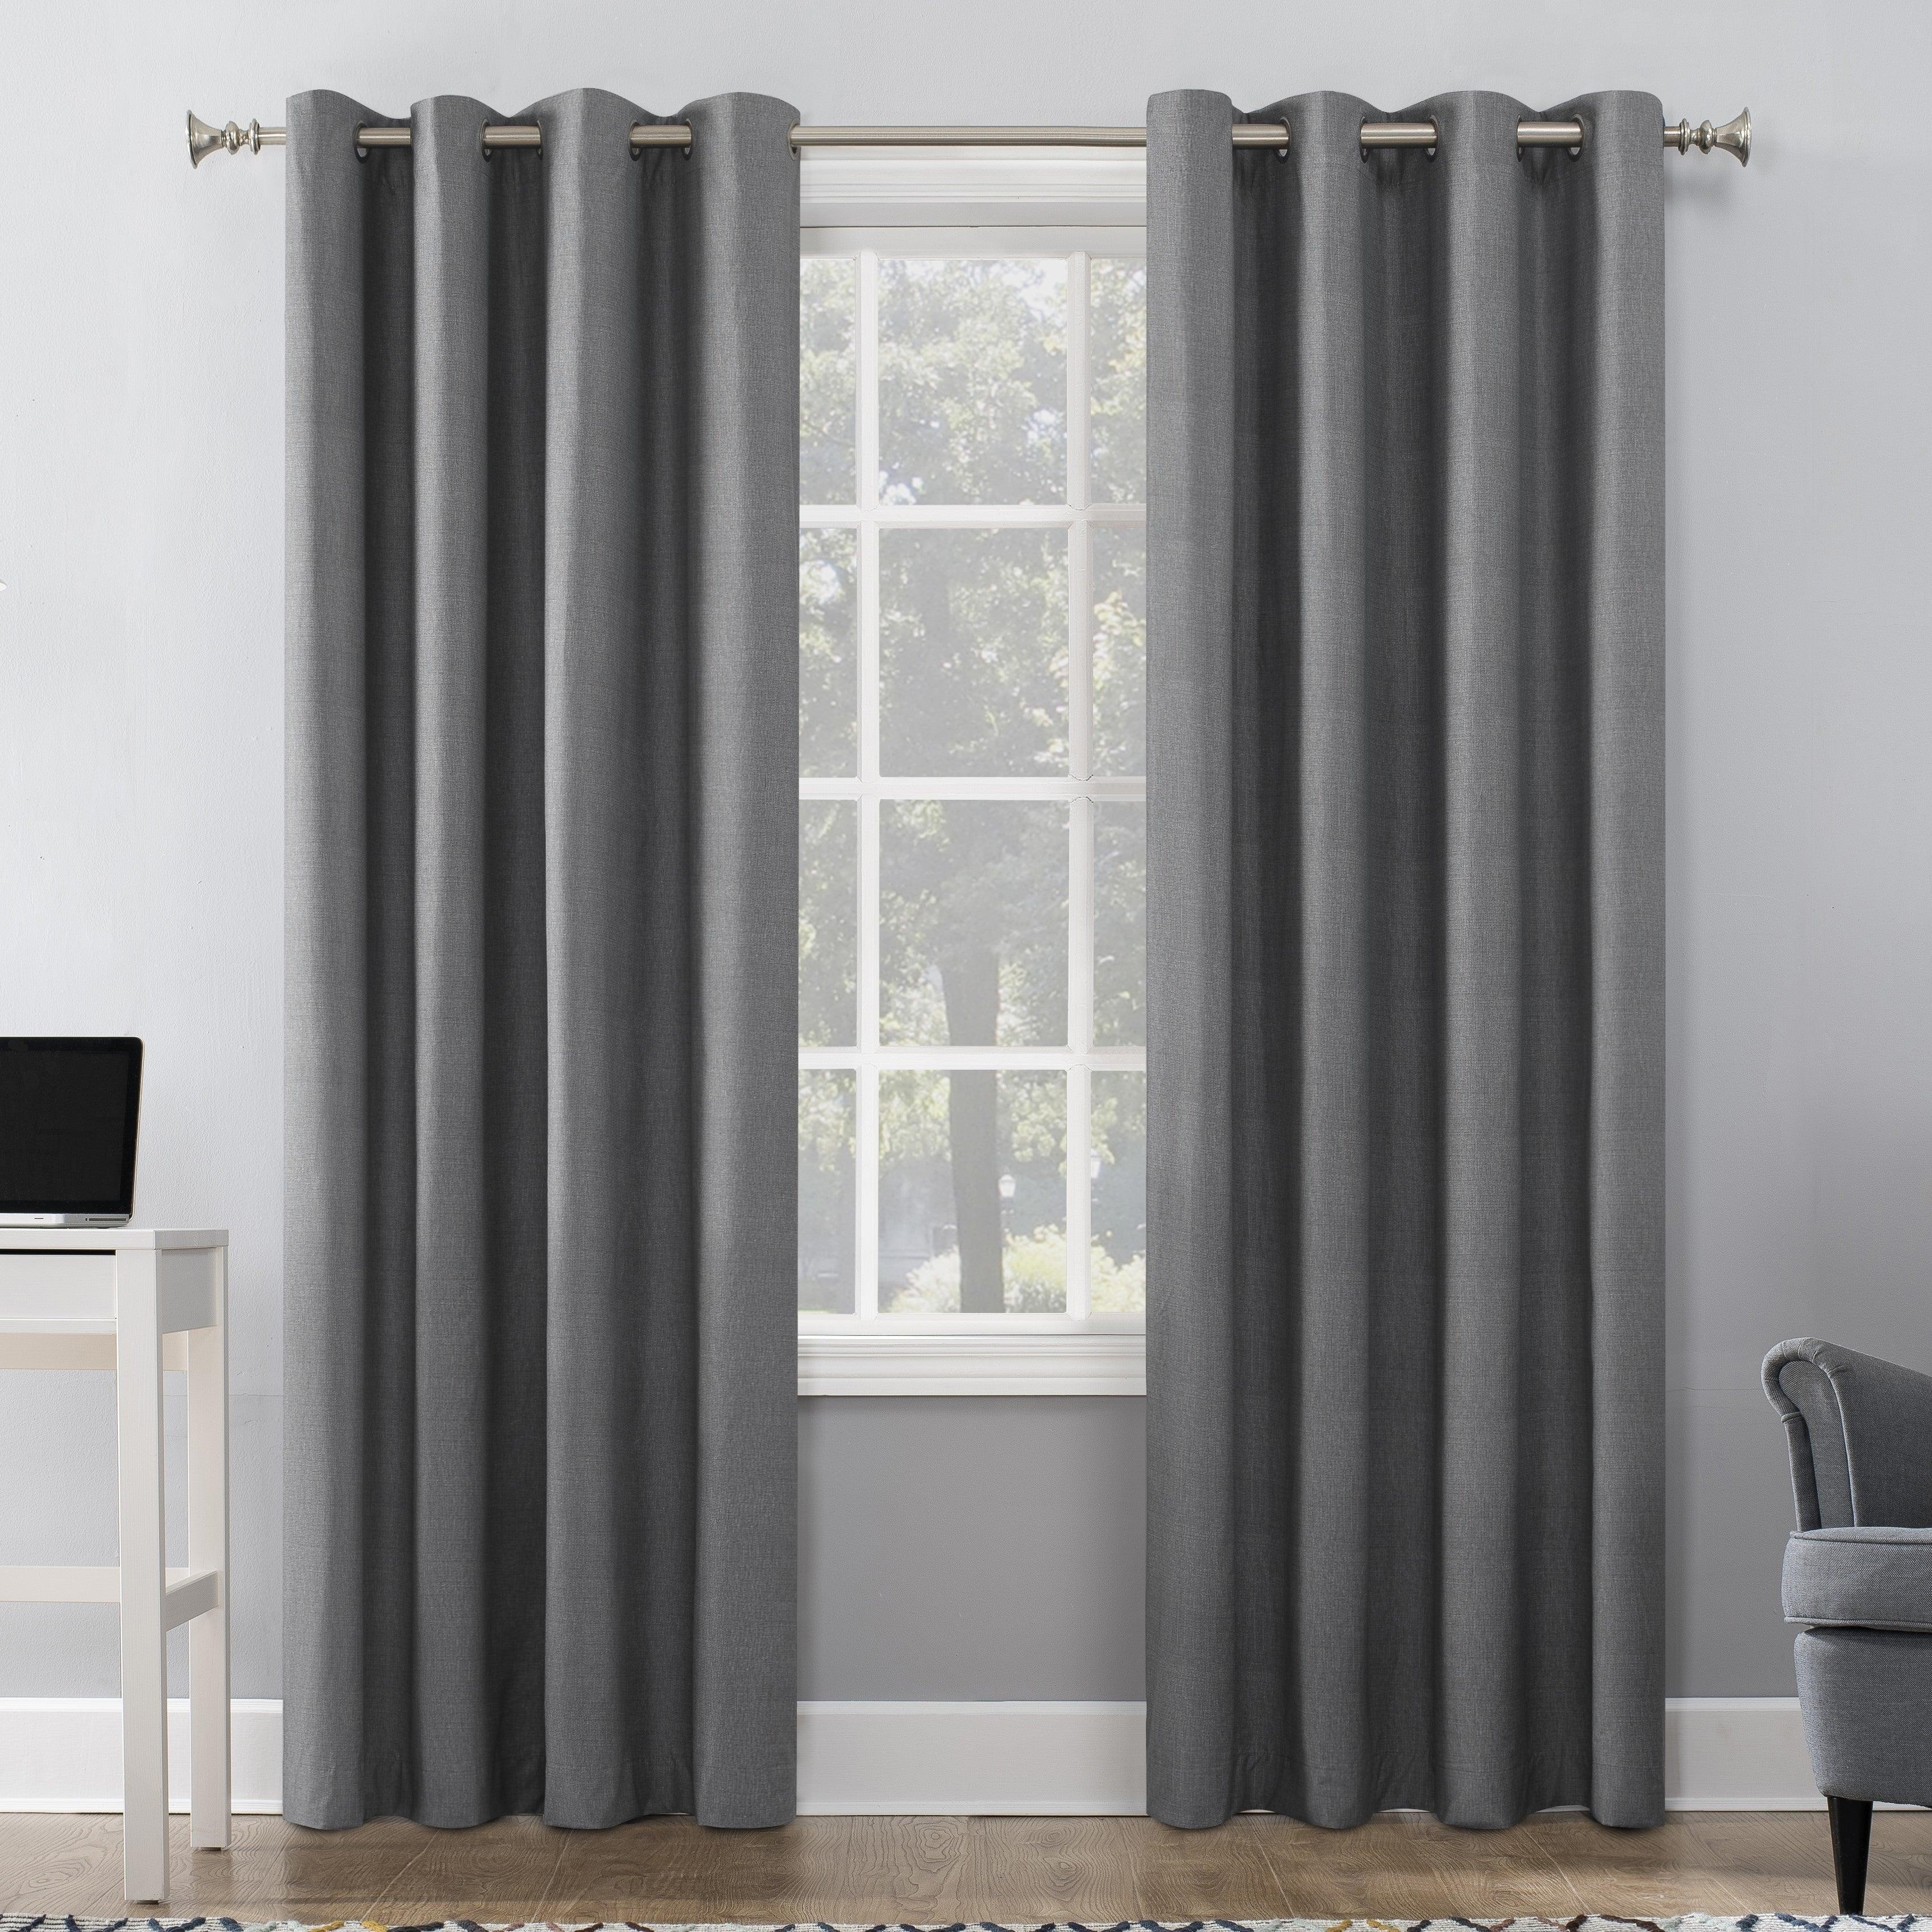 Sun Zero Duran Thermal Insulated 100% Blackout Grommet Curtain Panel With Regard To Hayden Grommet Blackout Single Curtain Panels (View 9 of 20)